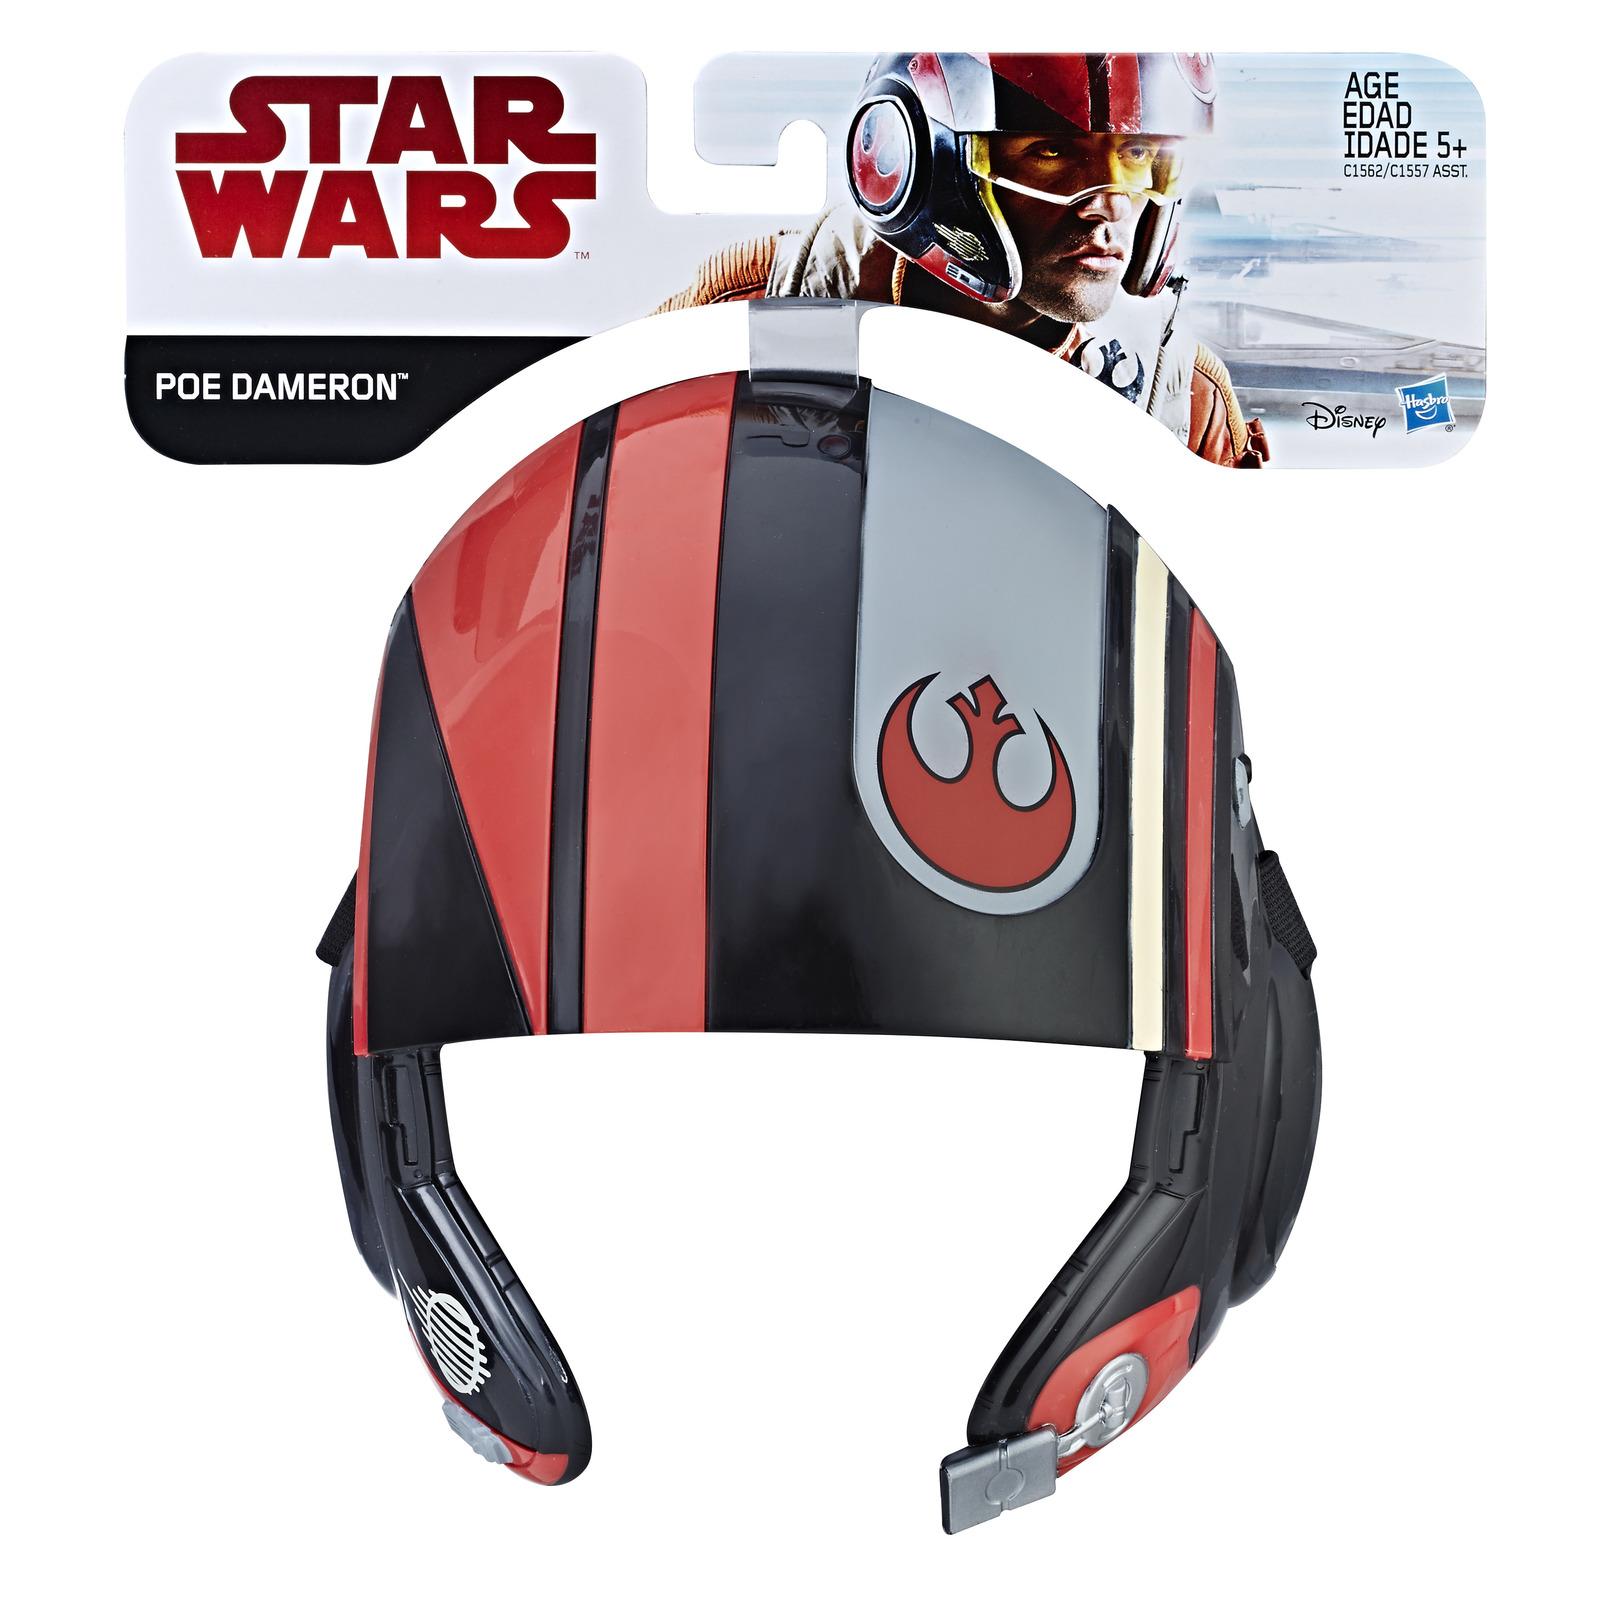 Star Wars: The Last Jedi Mask - Poe Dameron image